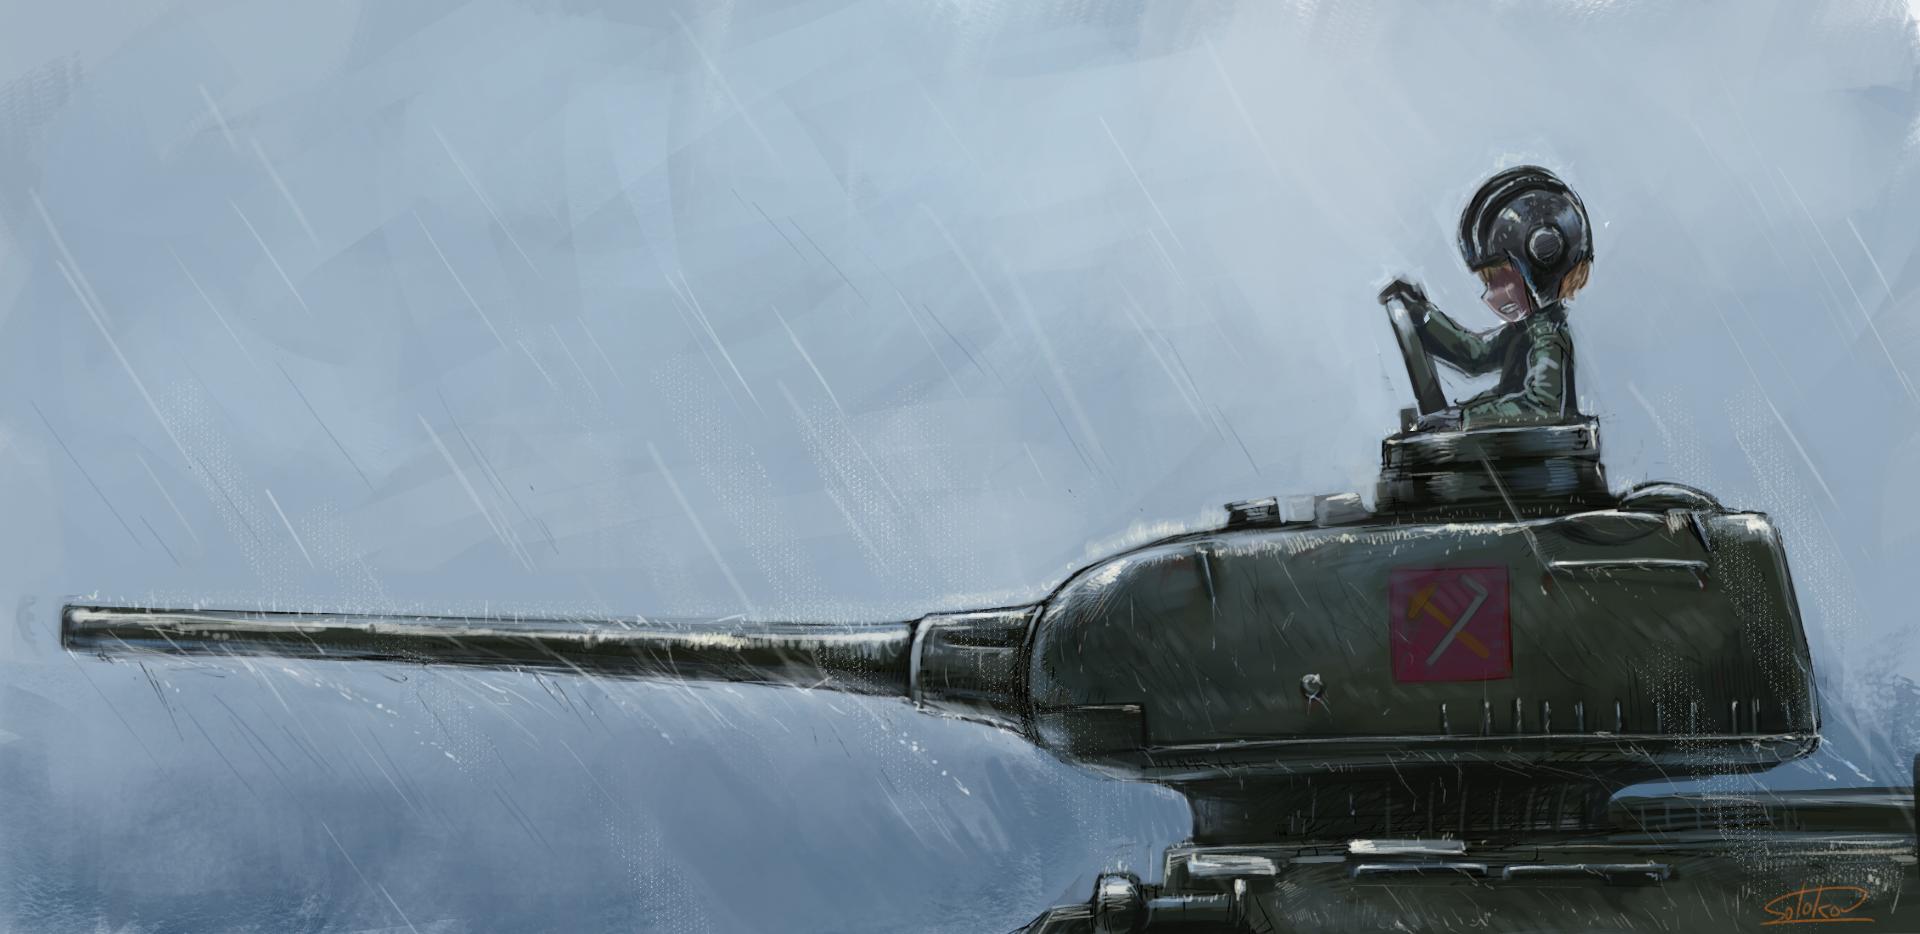 Heavy Rain Girls Und Panzer Anime Military Anime Tank Tank Girl